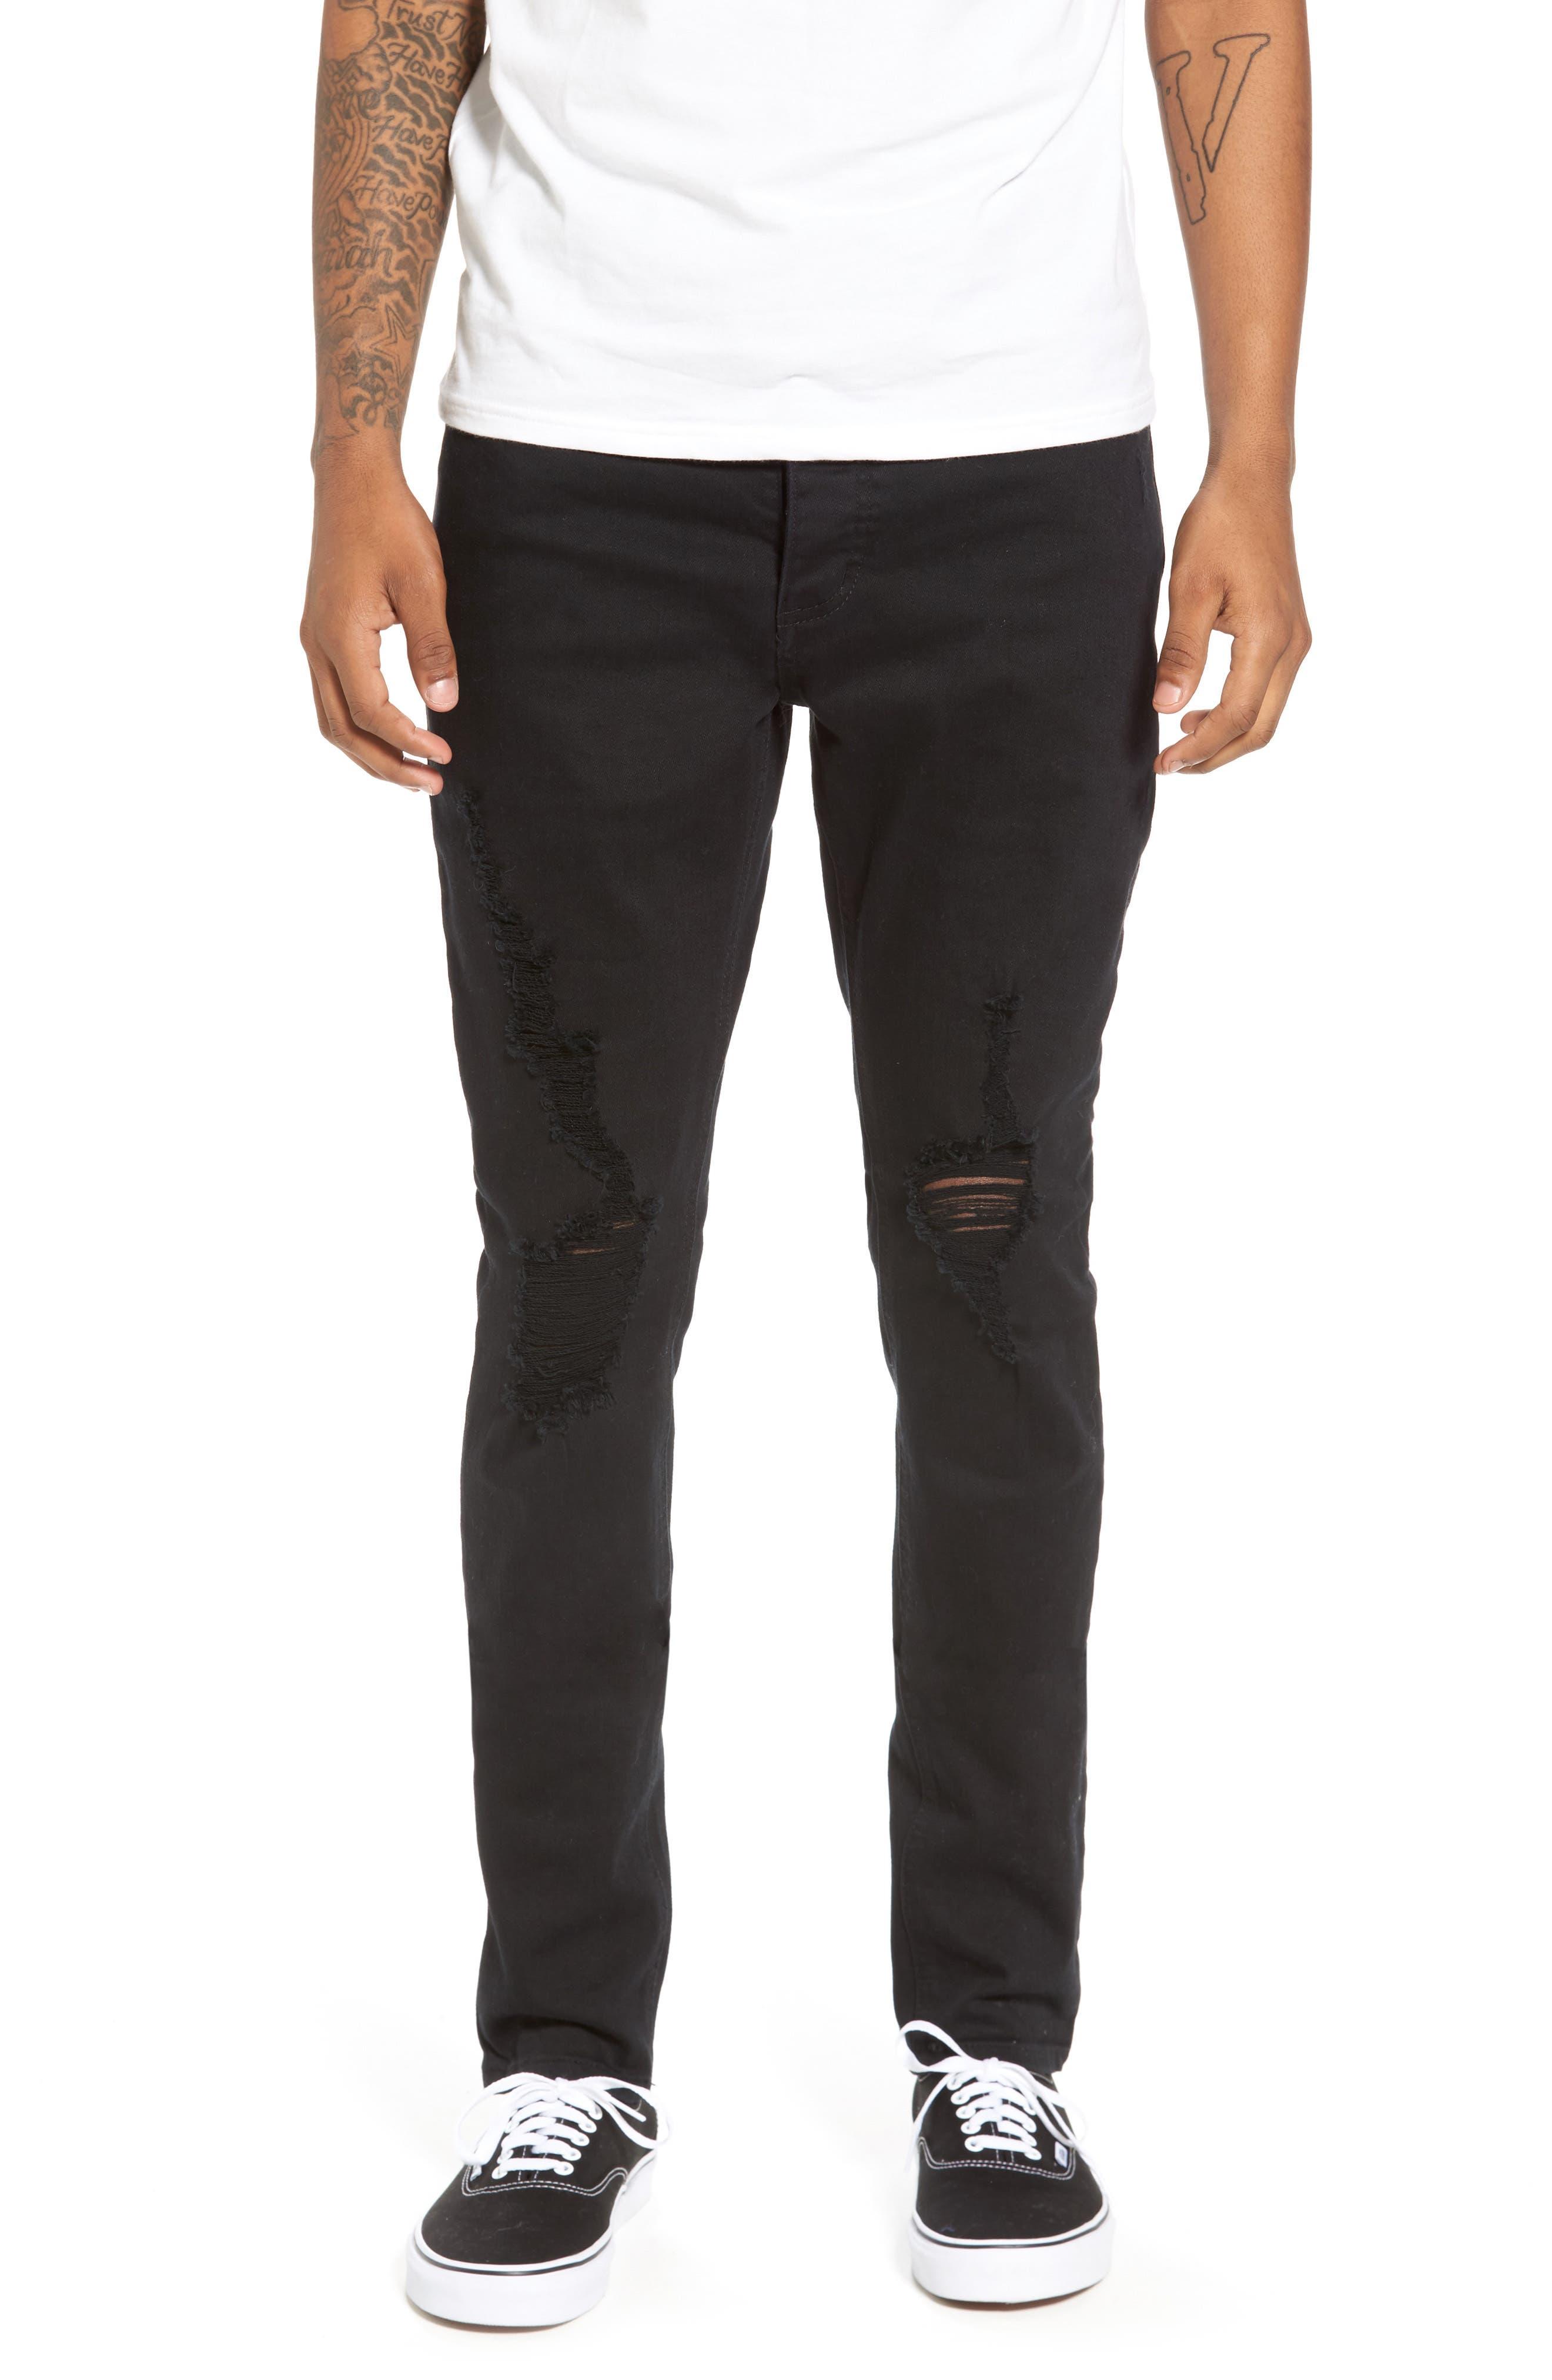 Joe Blow Destroyed Denim Jeans,                             Main thumbnail 1, color,                             Black Shred